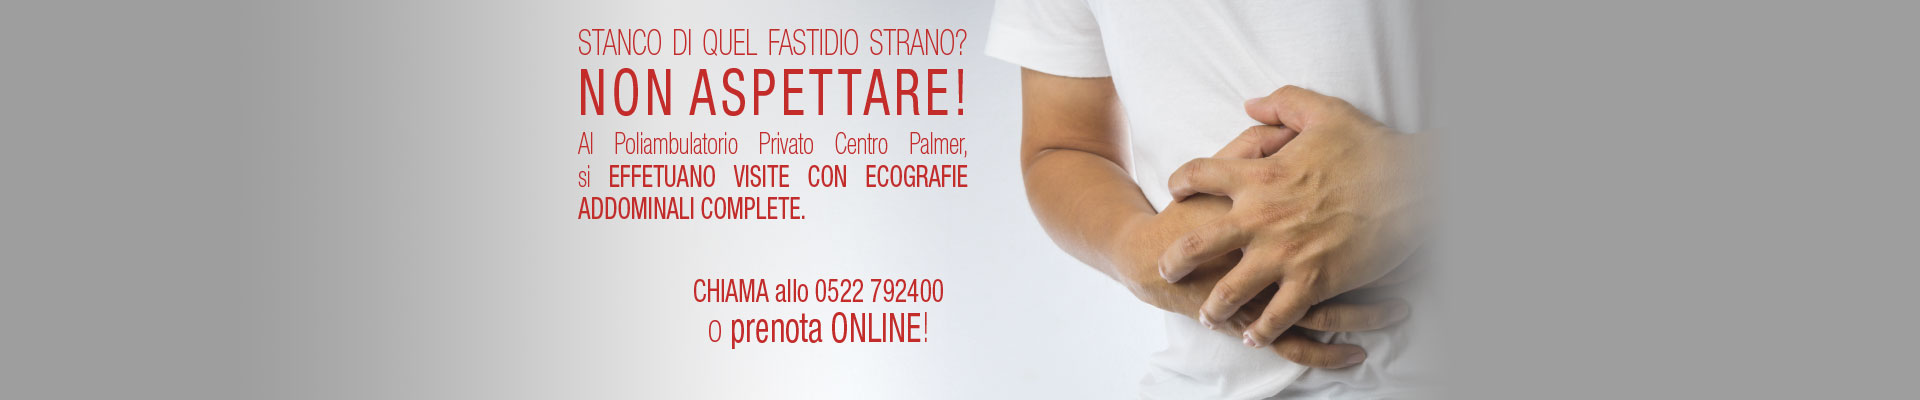 Slide Promo Medicina interna 02-2018 Centro Palmer